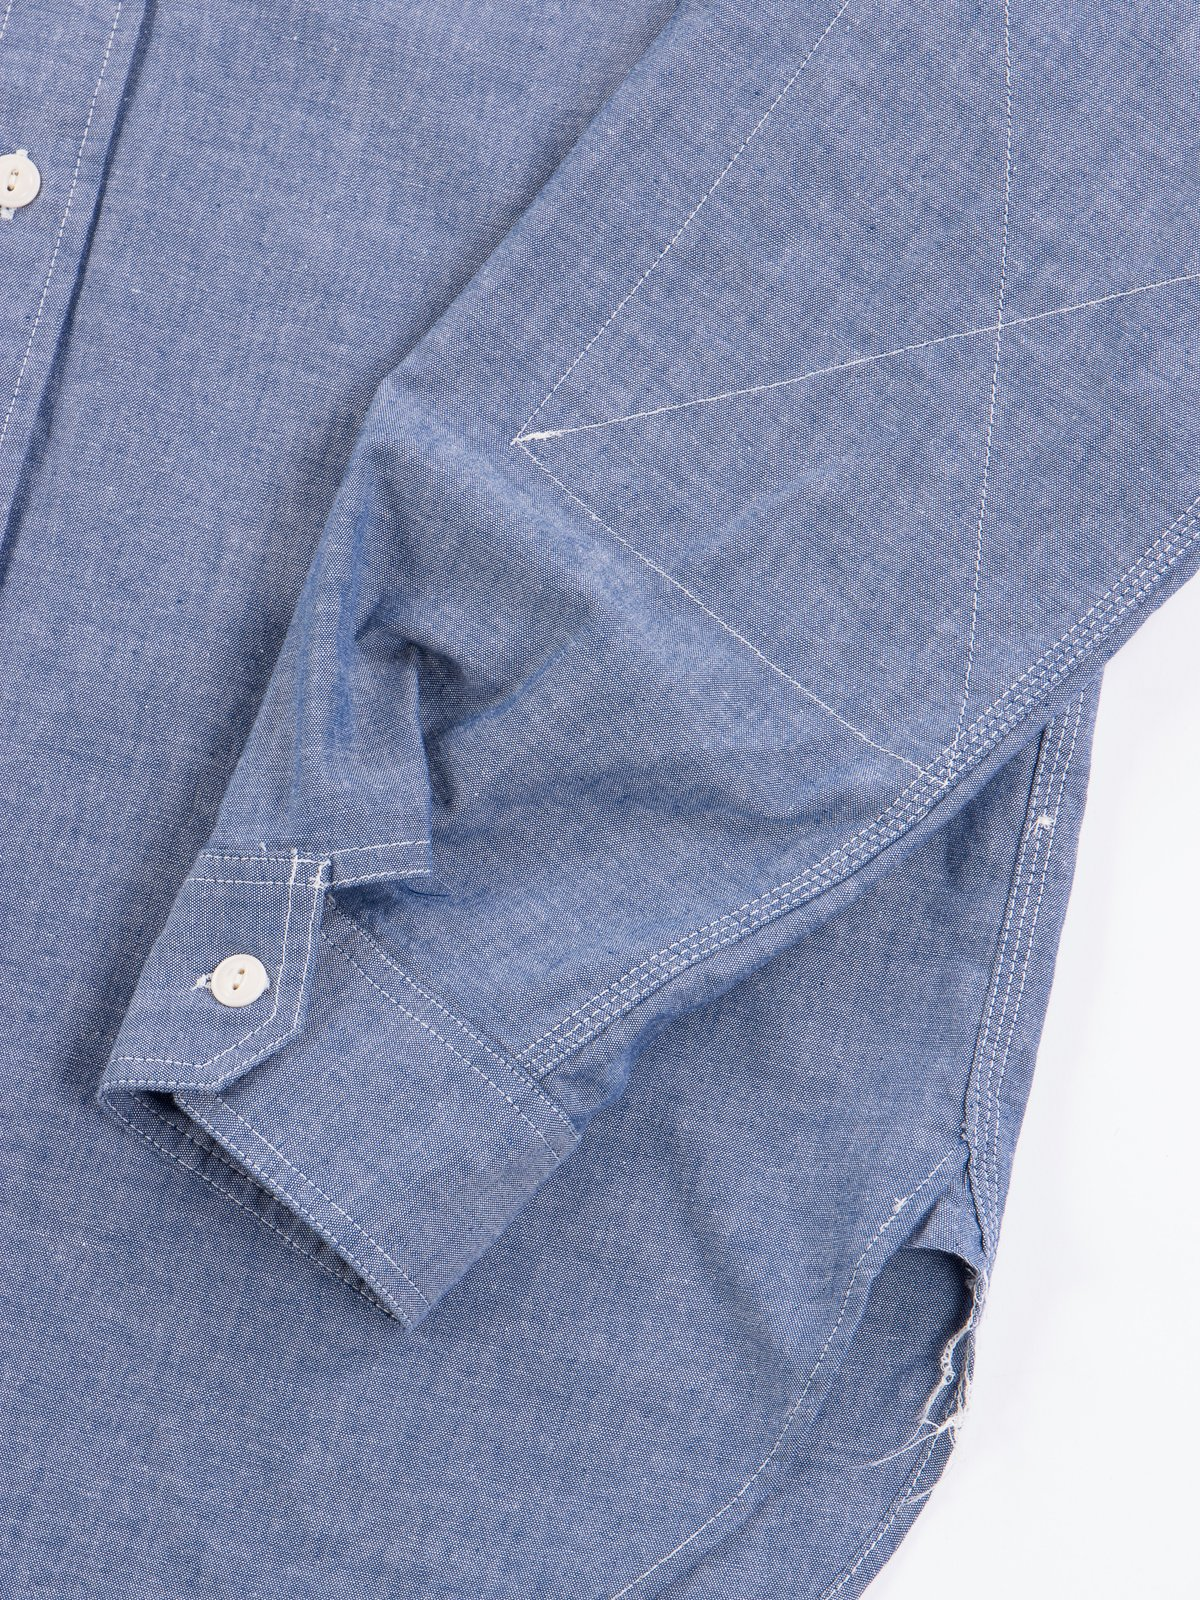 Blue Cotton Chambray Work Shirt - Image 4